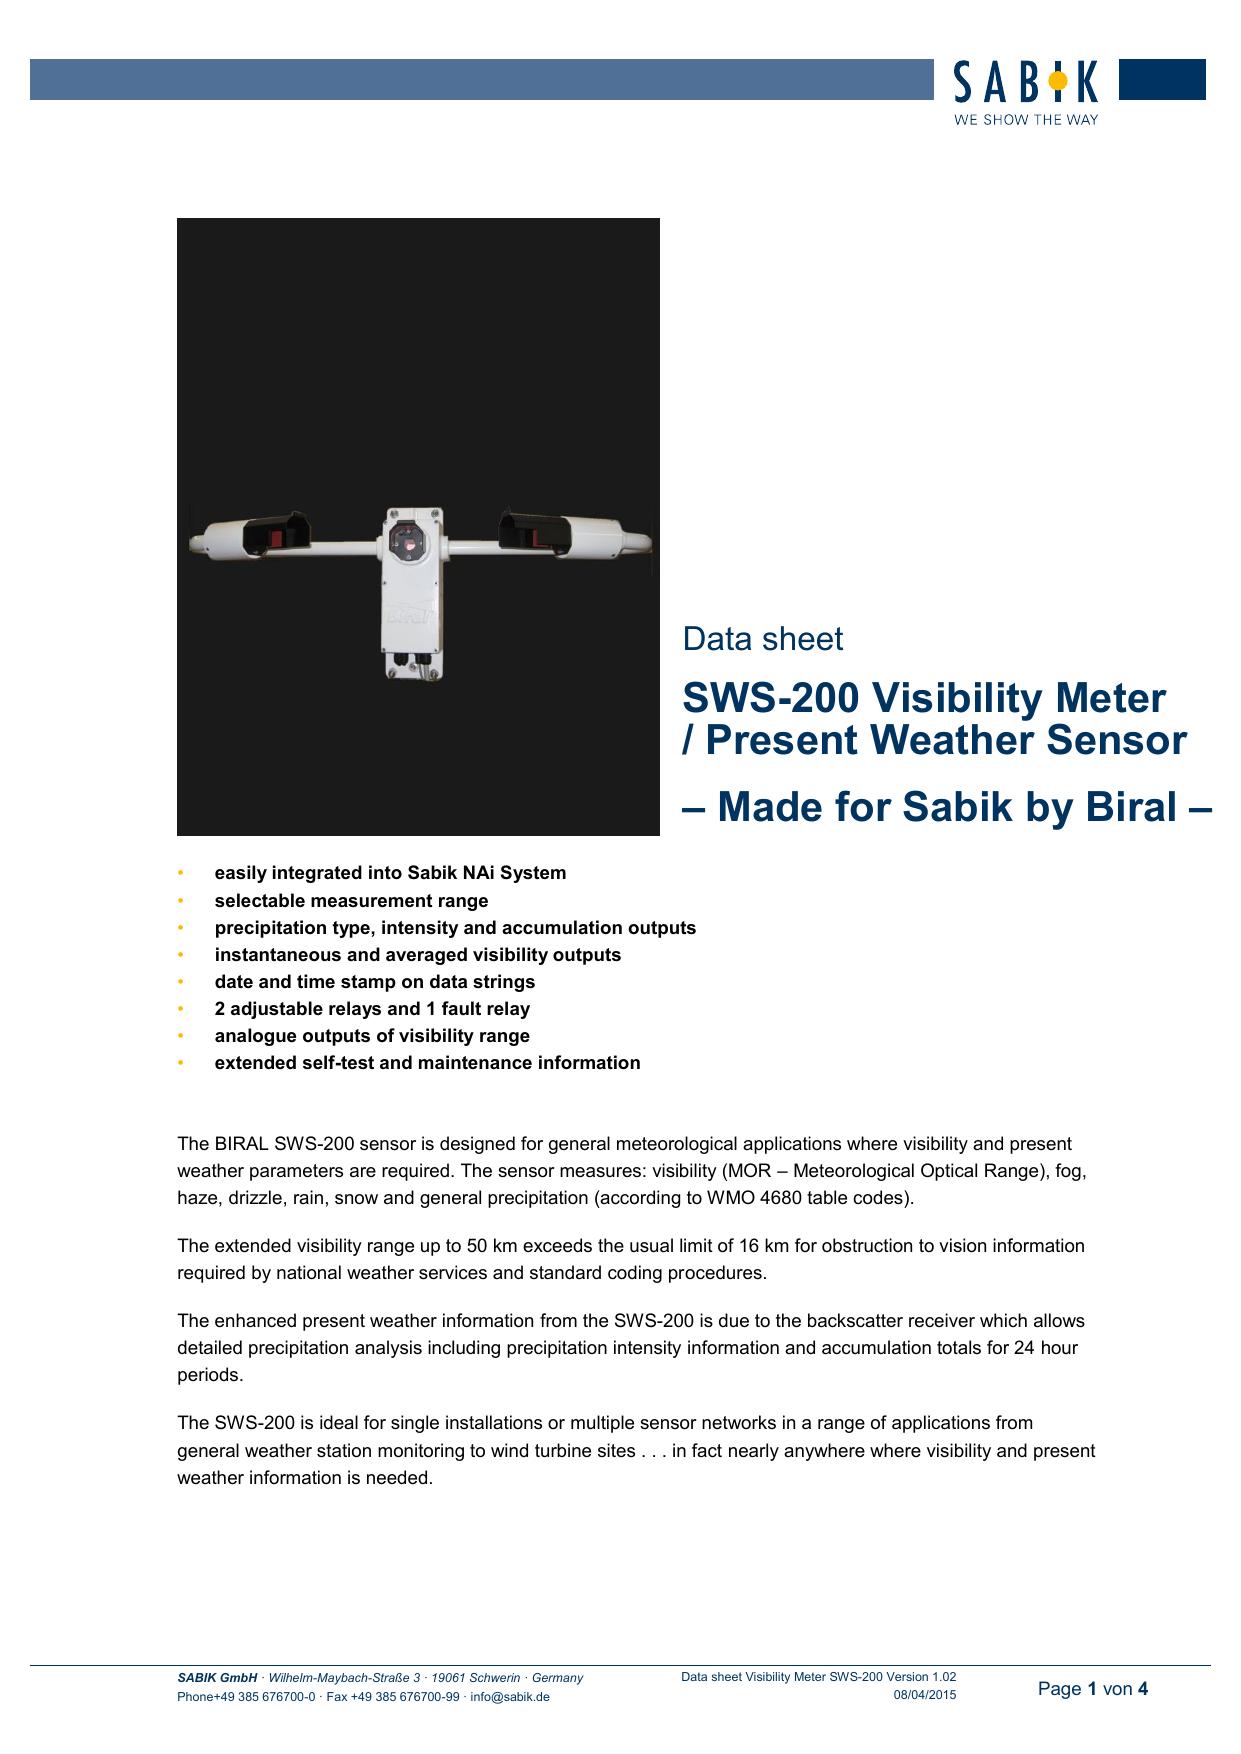 SWS-200 Visibility Meter / Present Weather Sensor | manualzz com